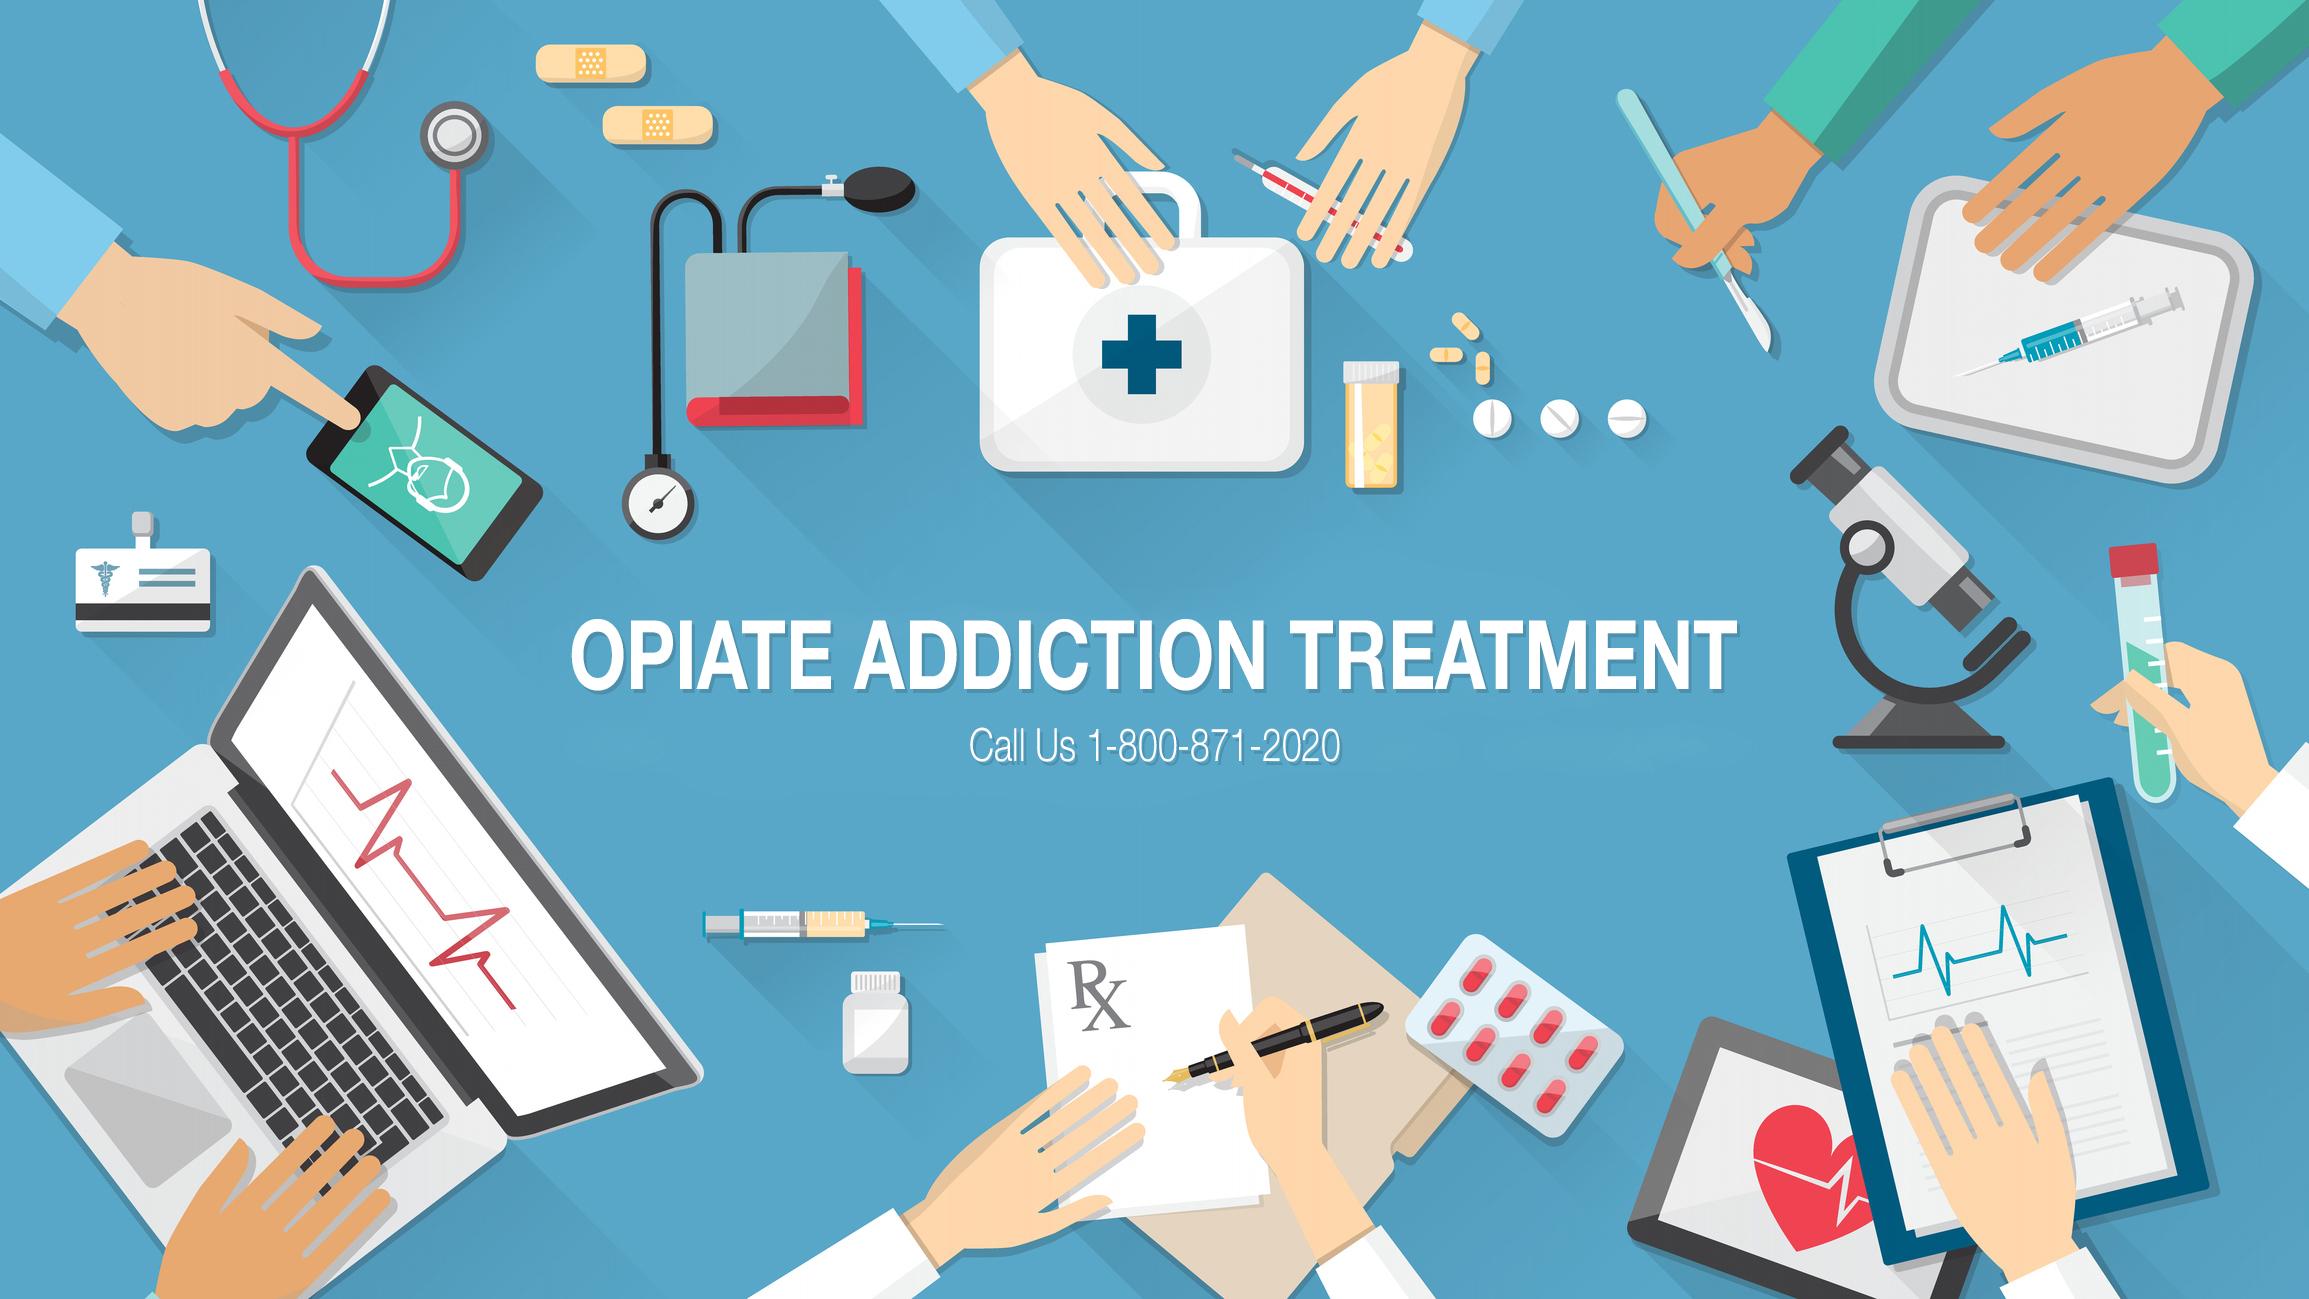 department of health 2016 rehabilitation centres pdf